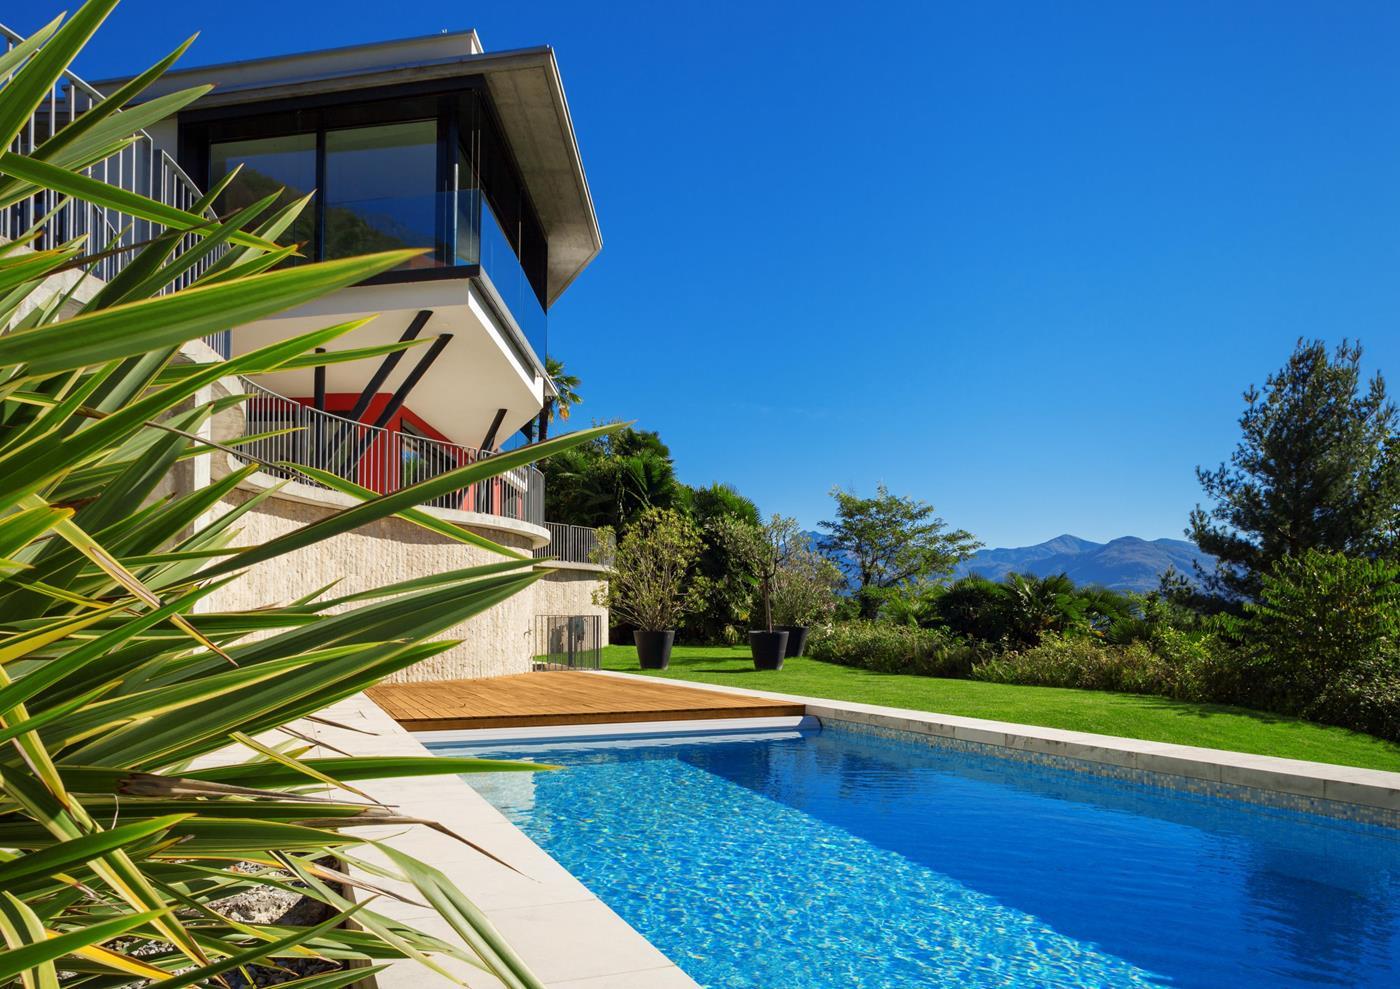 Swimming pool, Luxury modern villa in Ticino, Switzerland for sale